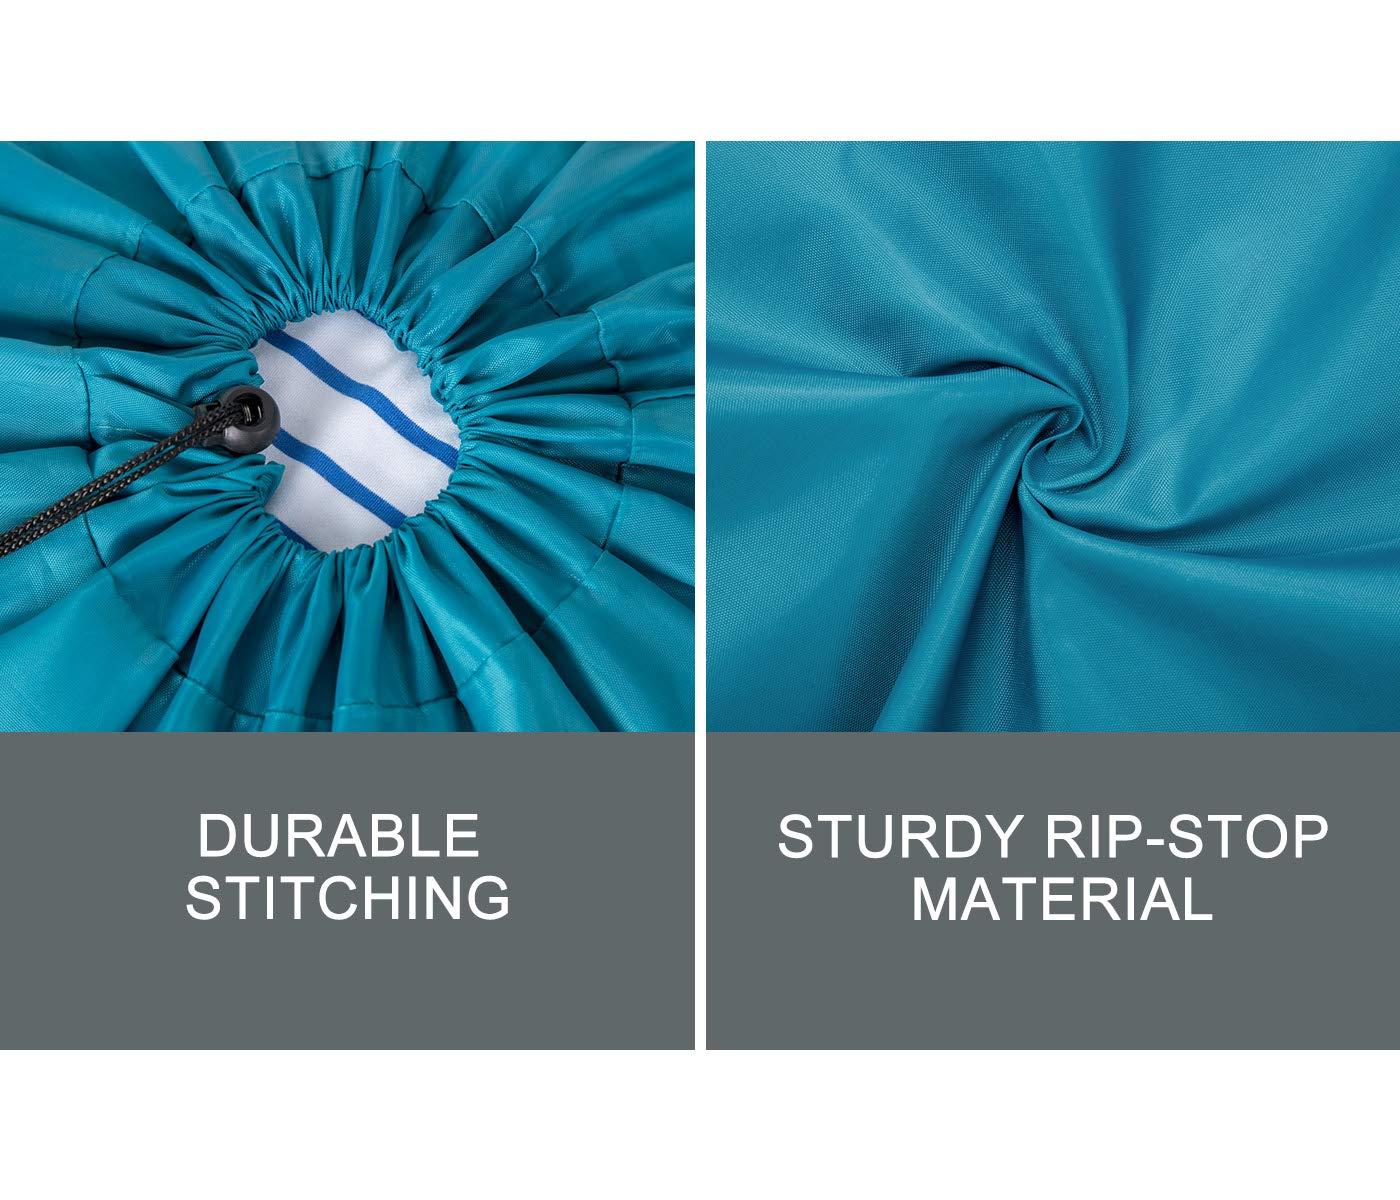 ZERO JET LAG 2 Pack Extra Large Travel Laundry Bag Set Nylon Rip-Stop Dirty Storage Bag Machine Washable Drawstring Closure 24'' x 36'' (Blue and Gray) by ZERO JET LAG (Image #2)